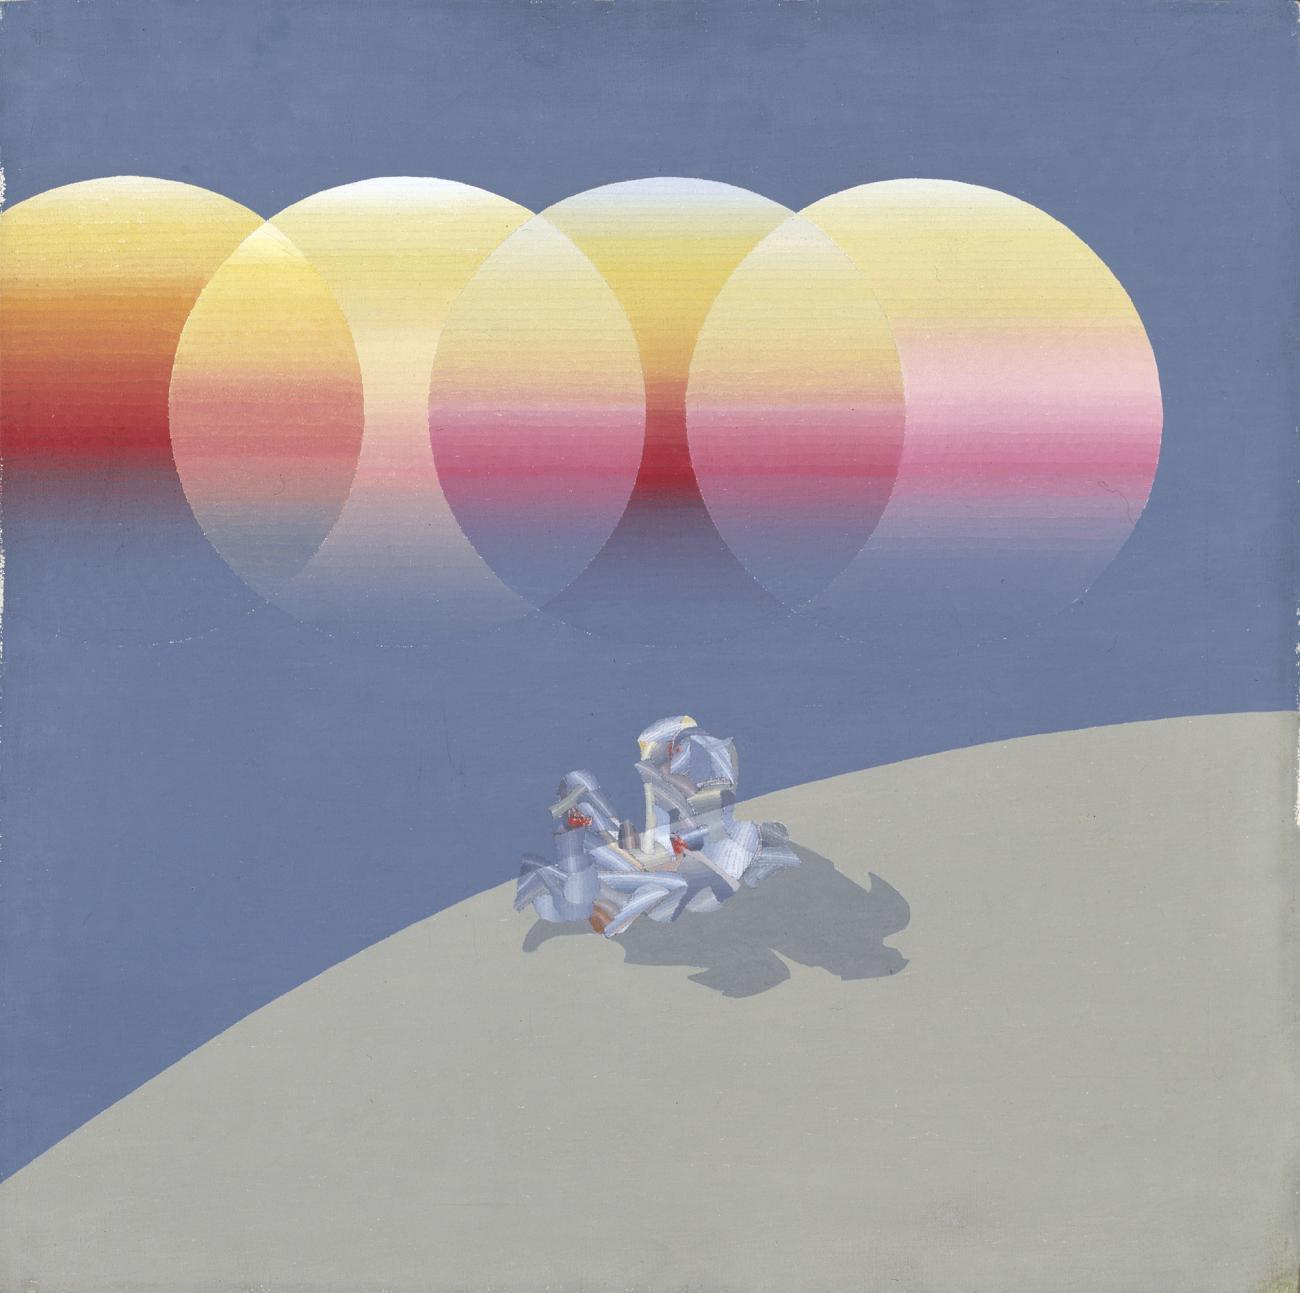 Untitled - 1984.124.274 - 53040